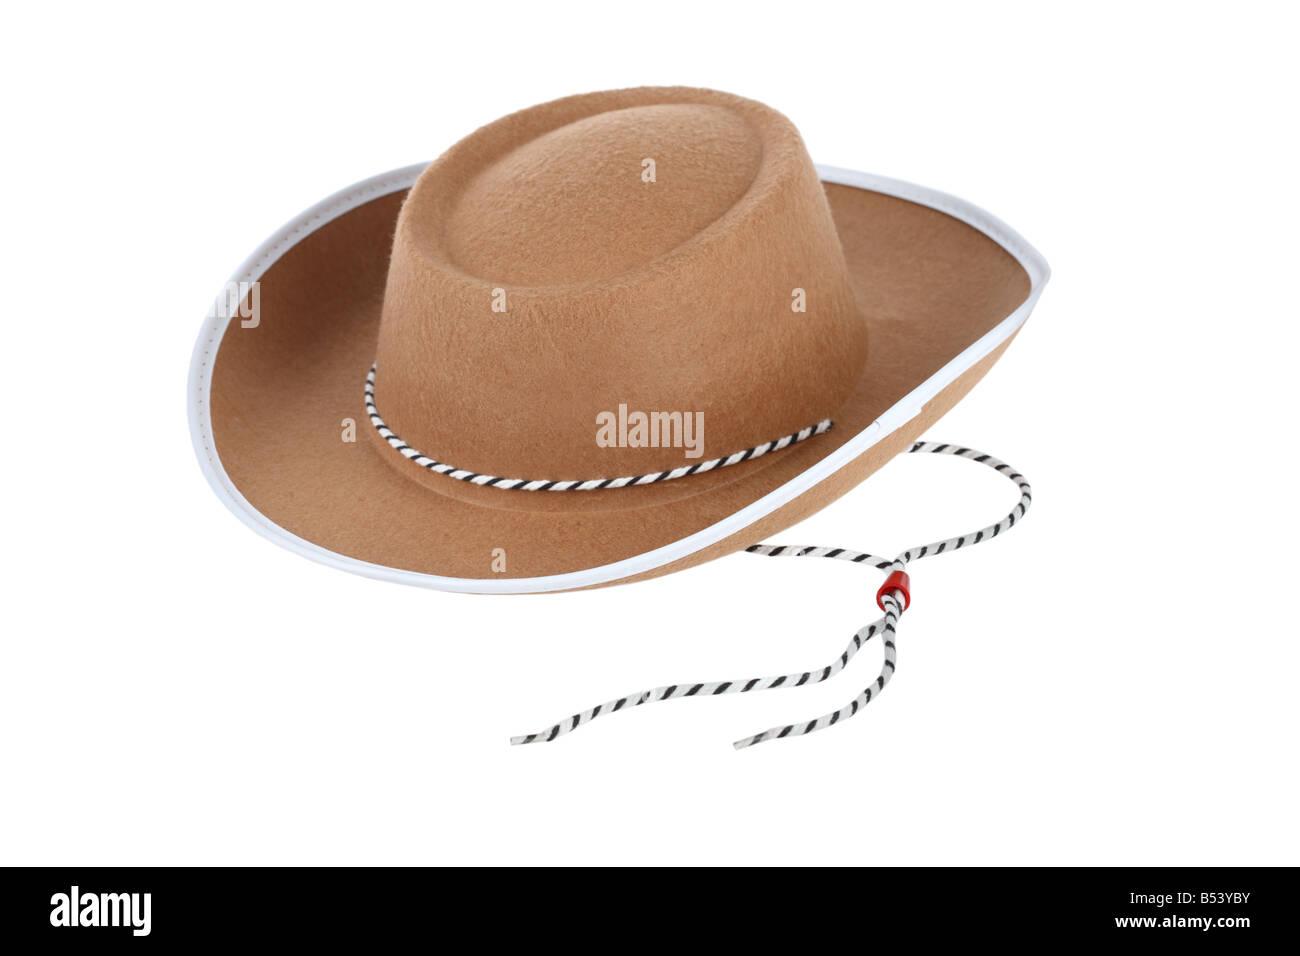 Cowboy hat cutout isolated on white background - Stock Image